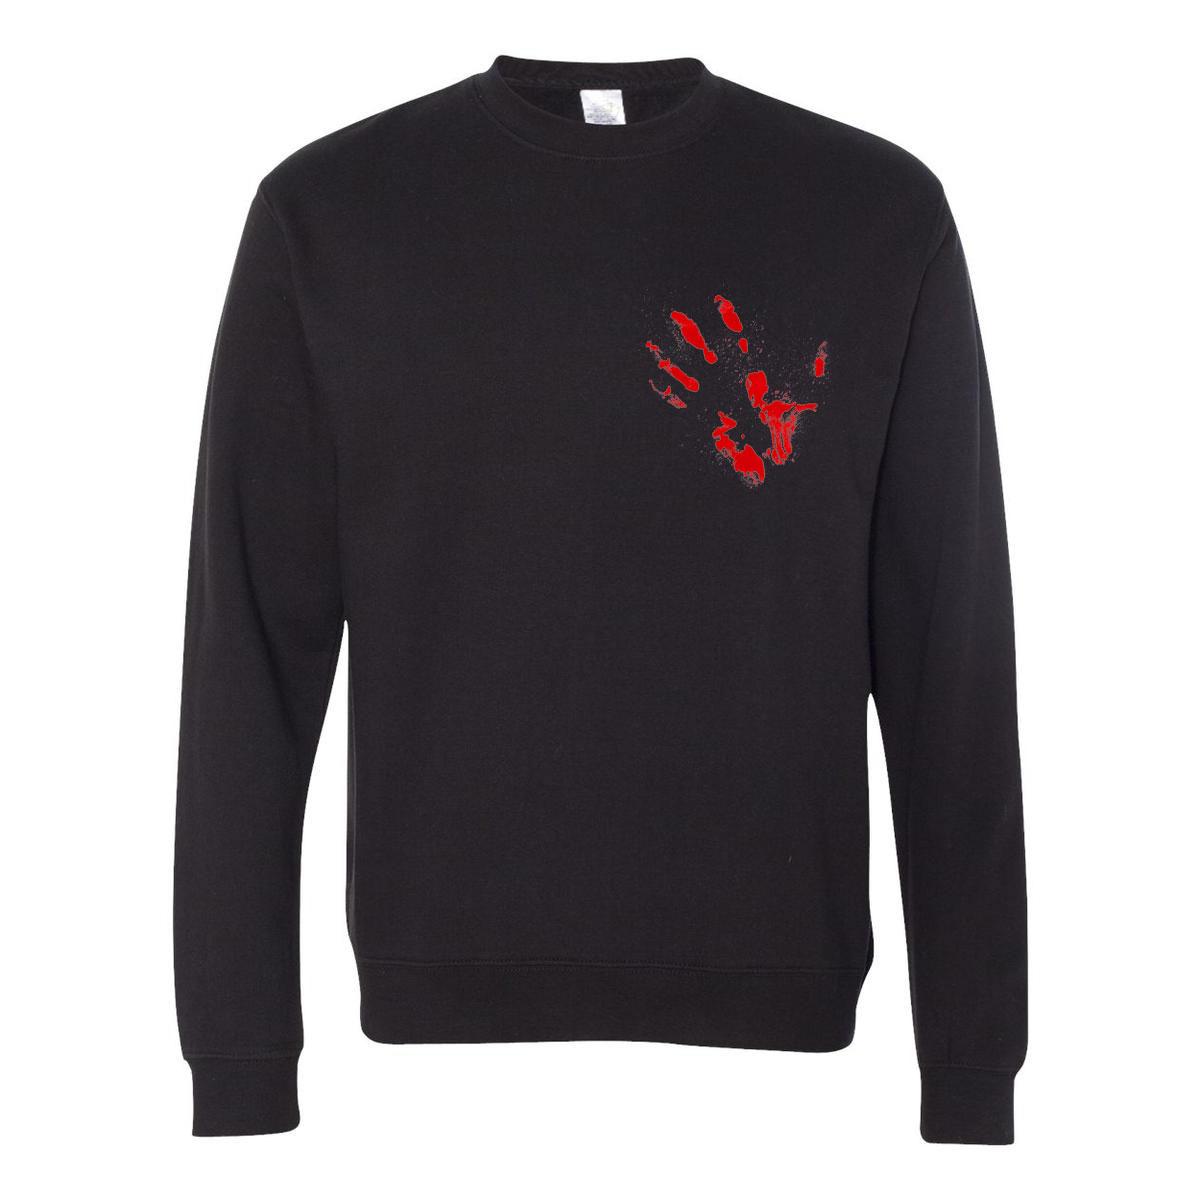 Crewneck Sweatshirt + Album + Dowload